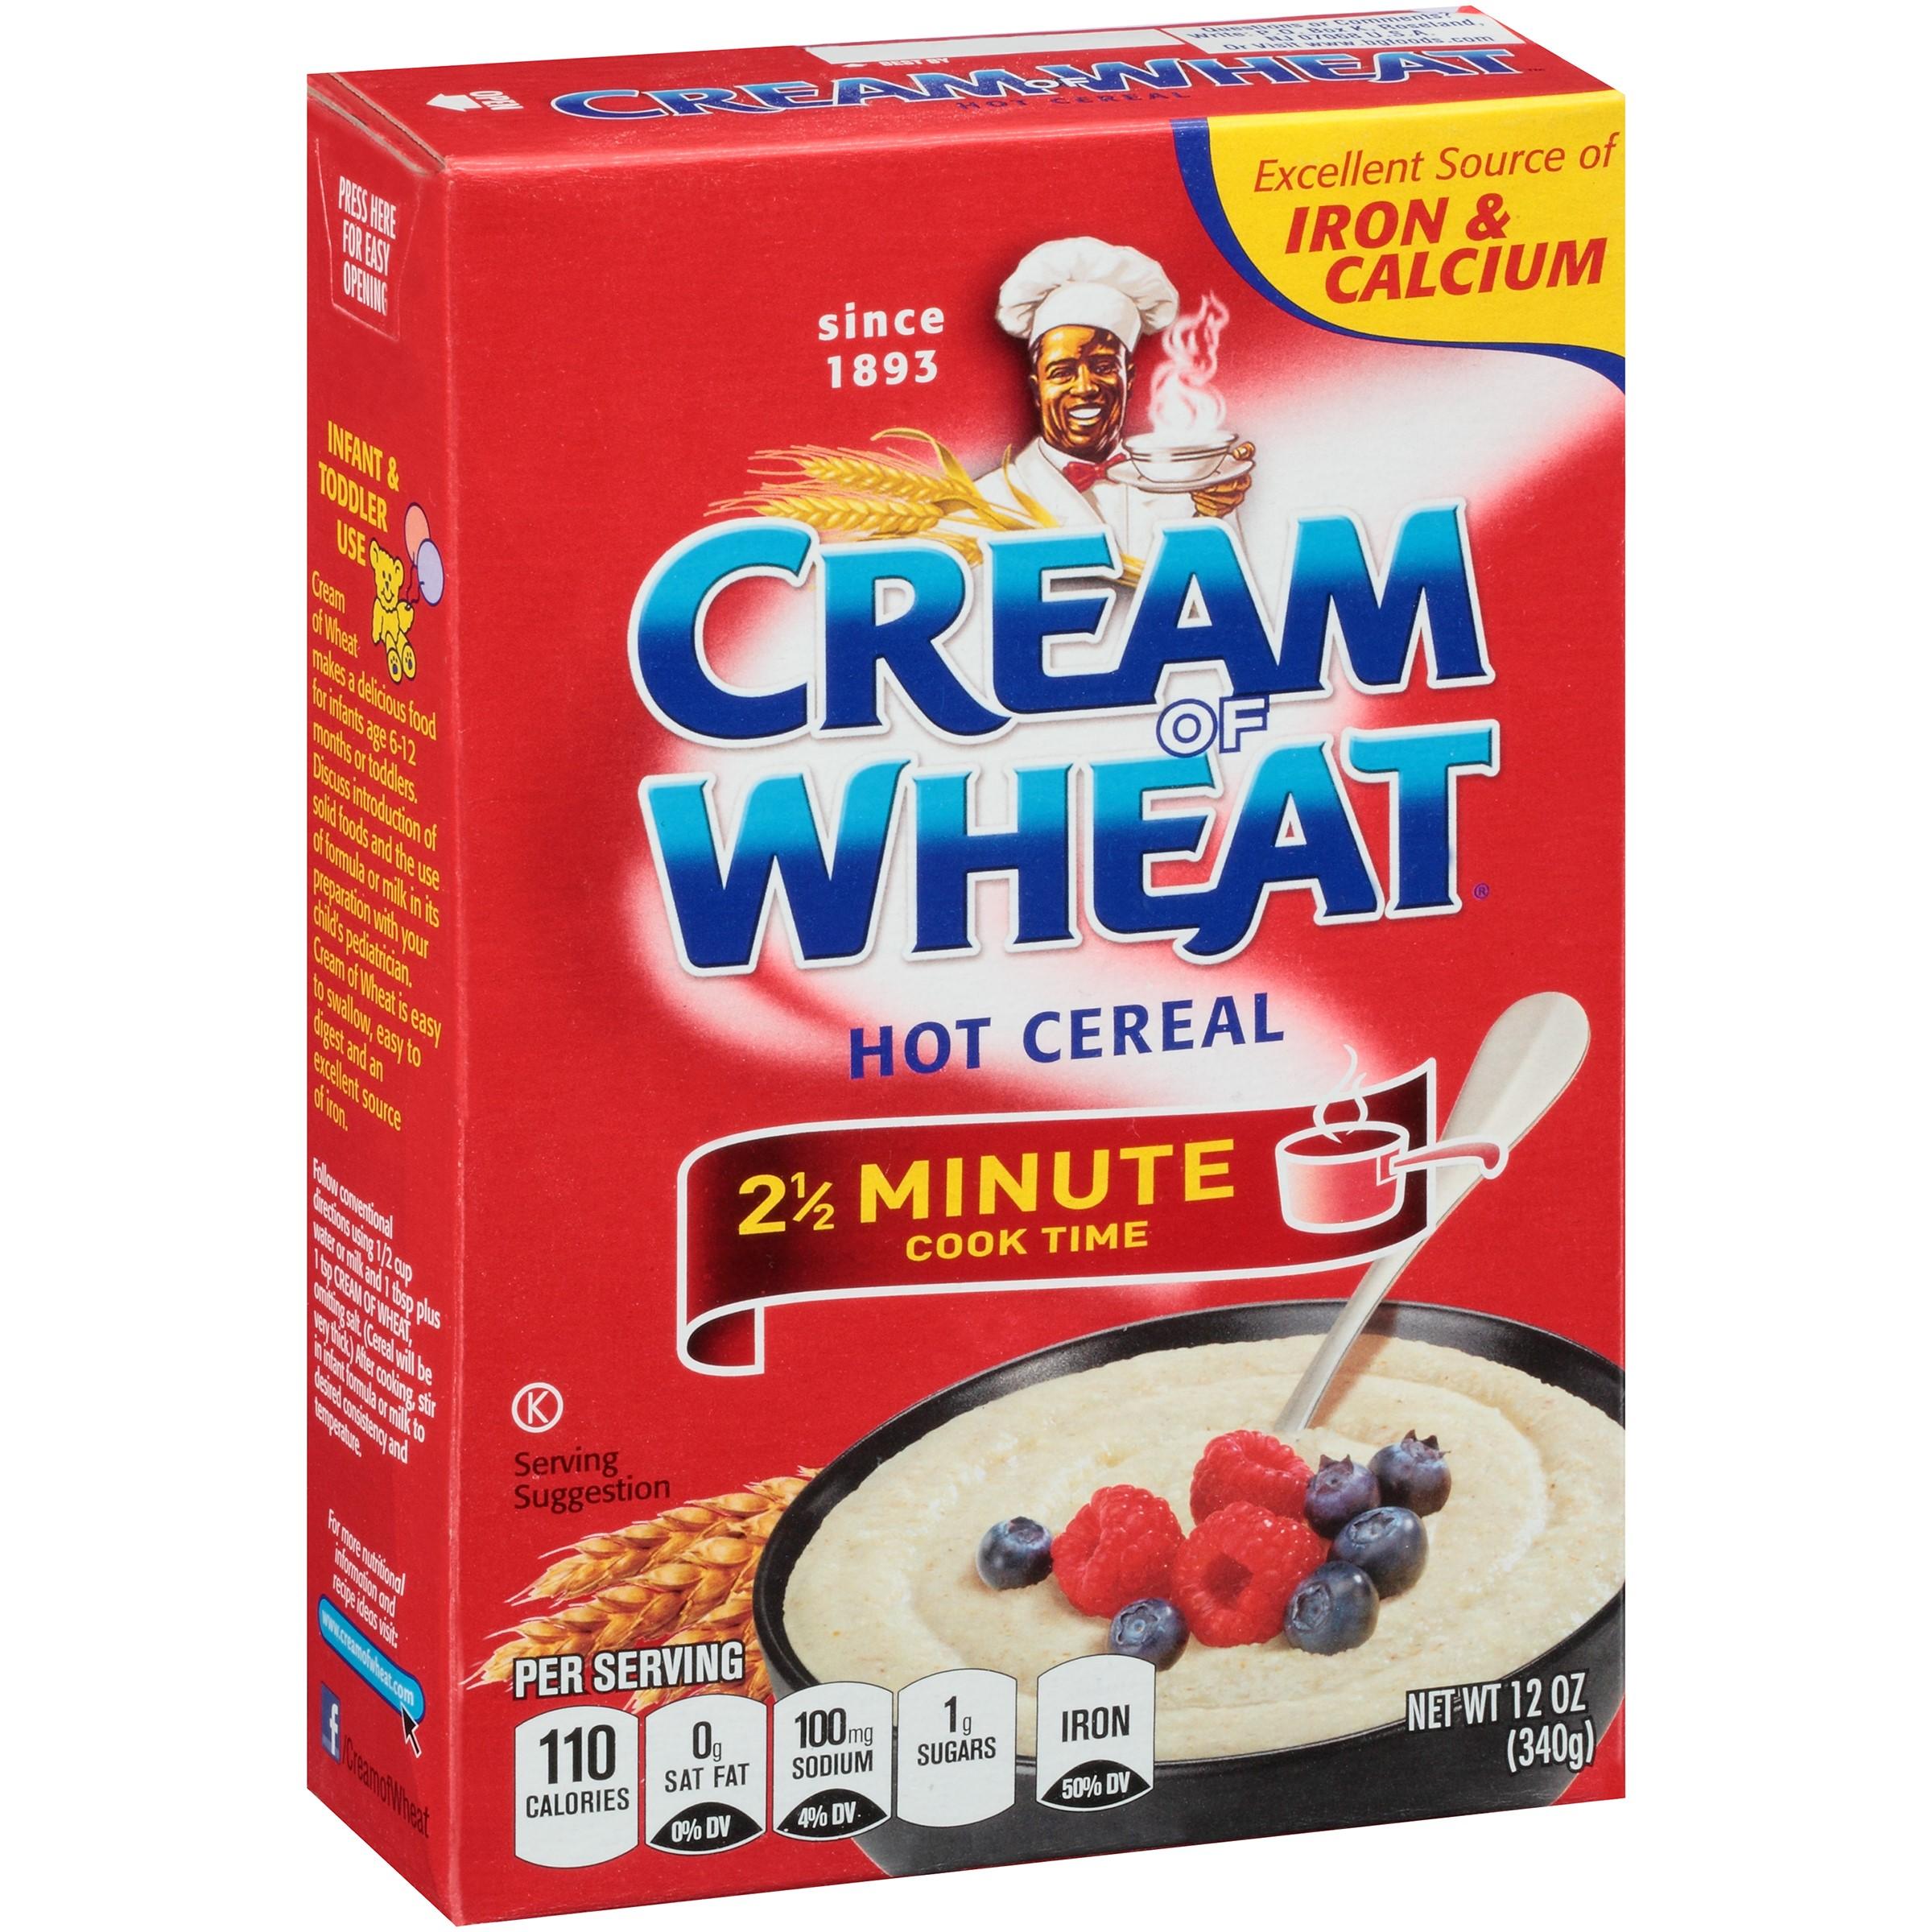 Cream Of Wheat Stove Top Hot Cereal, Original, 12 Oz